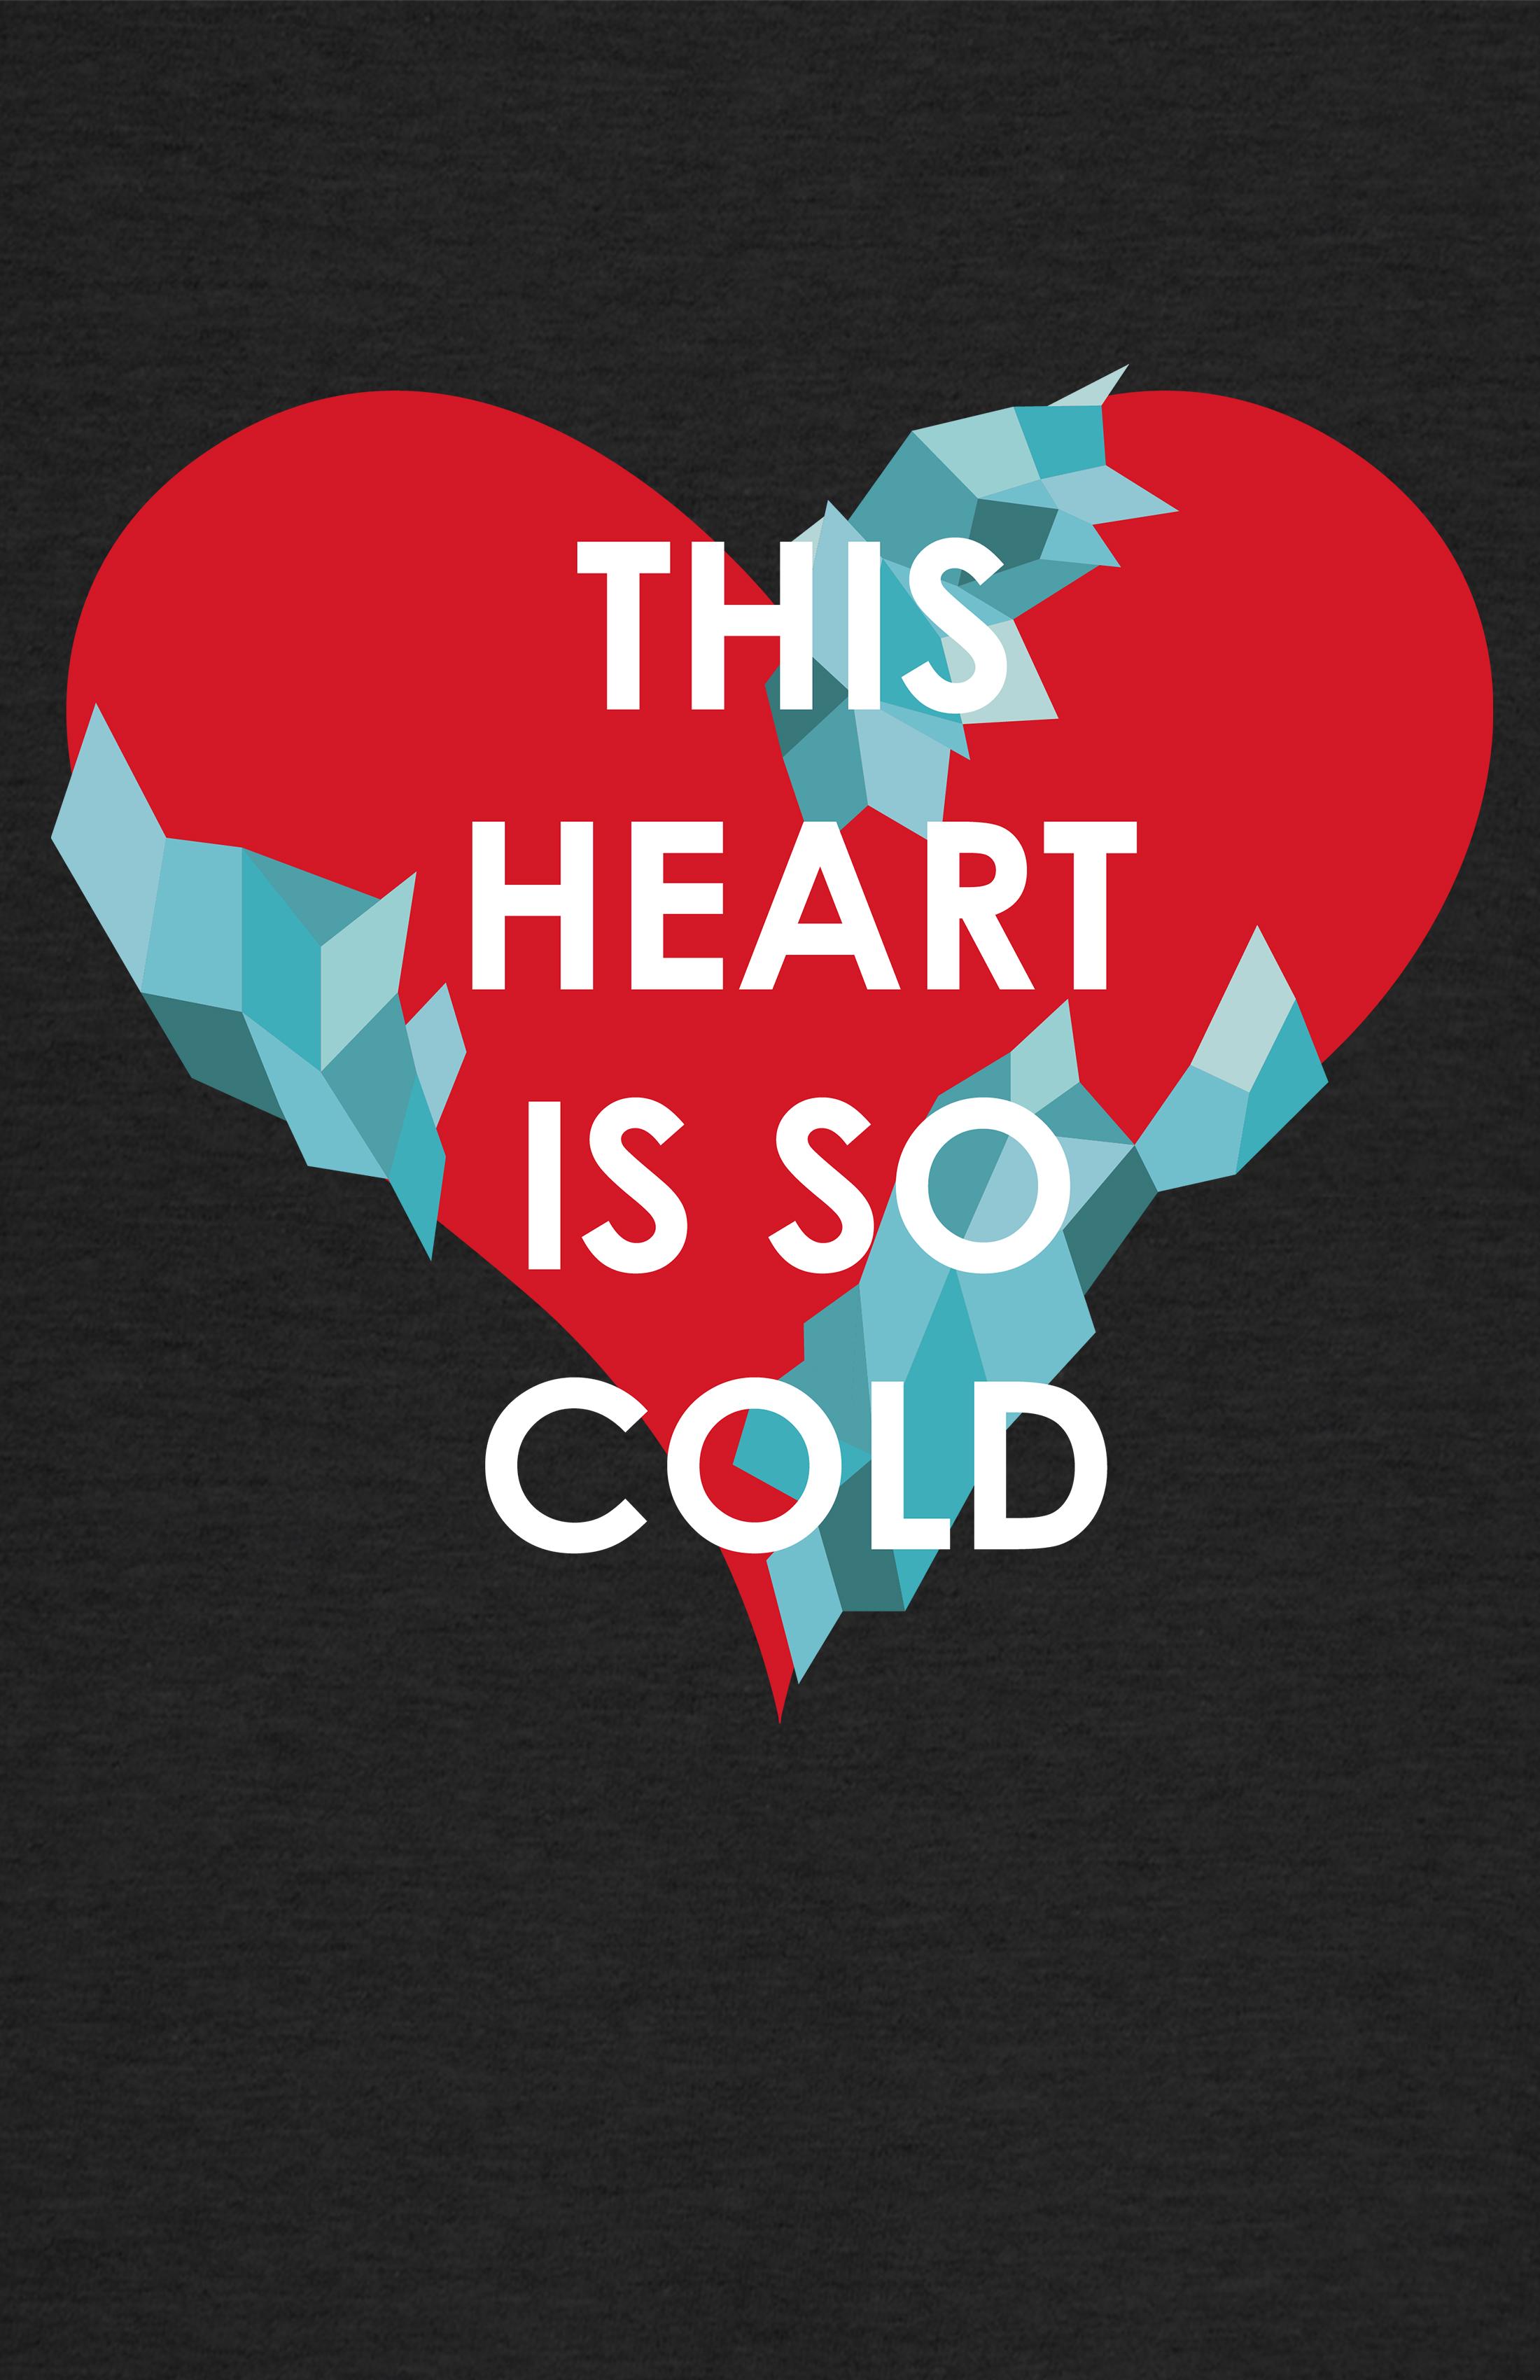 heartsocold.jpg